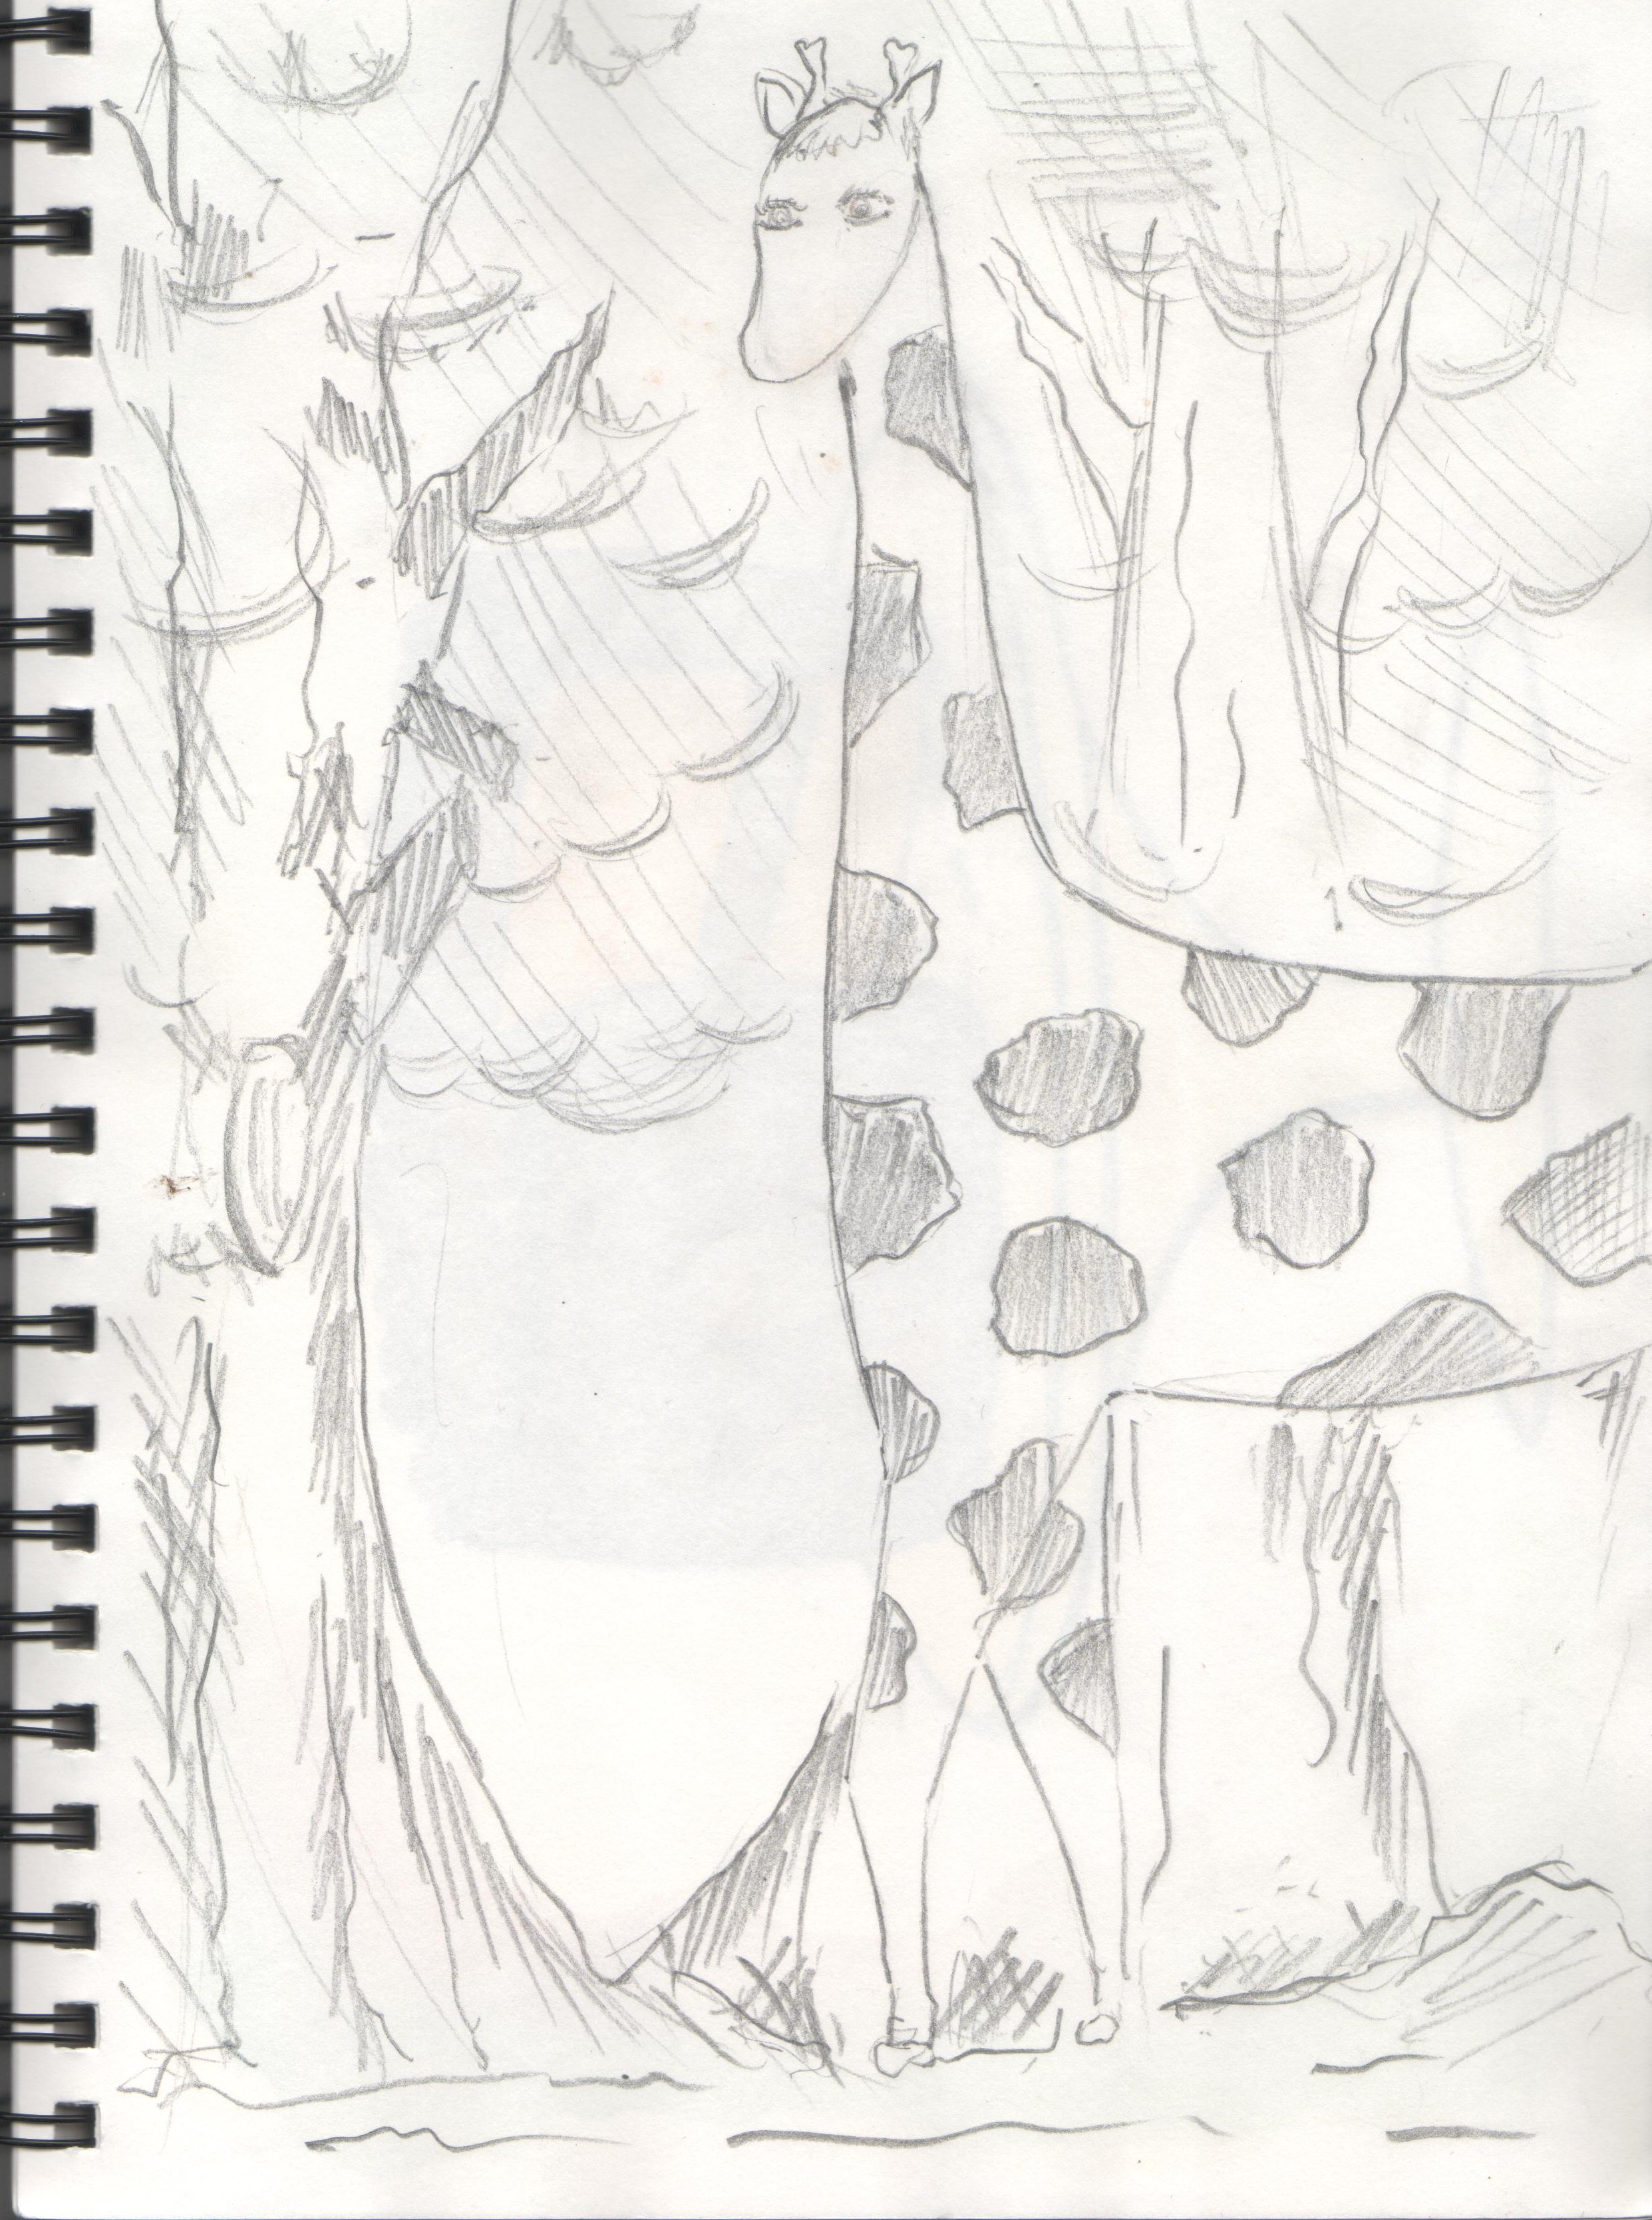 2483x3336 The Giraffe, Pencil On Paper.